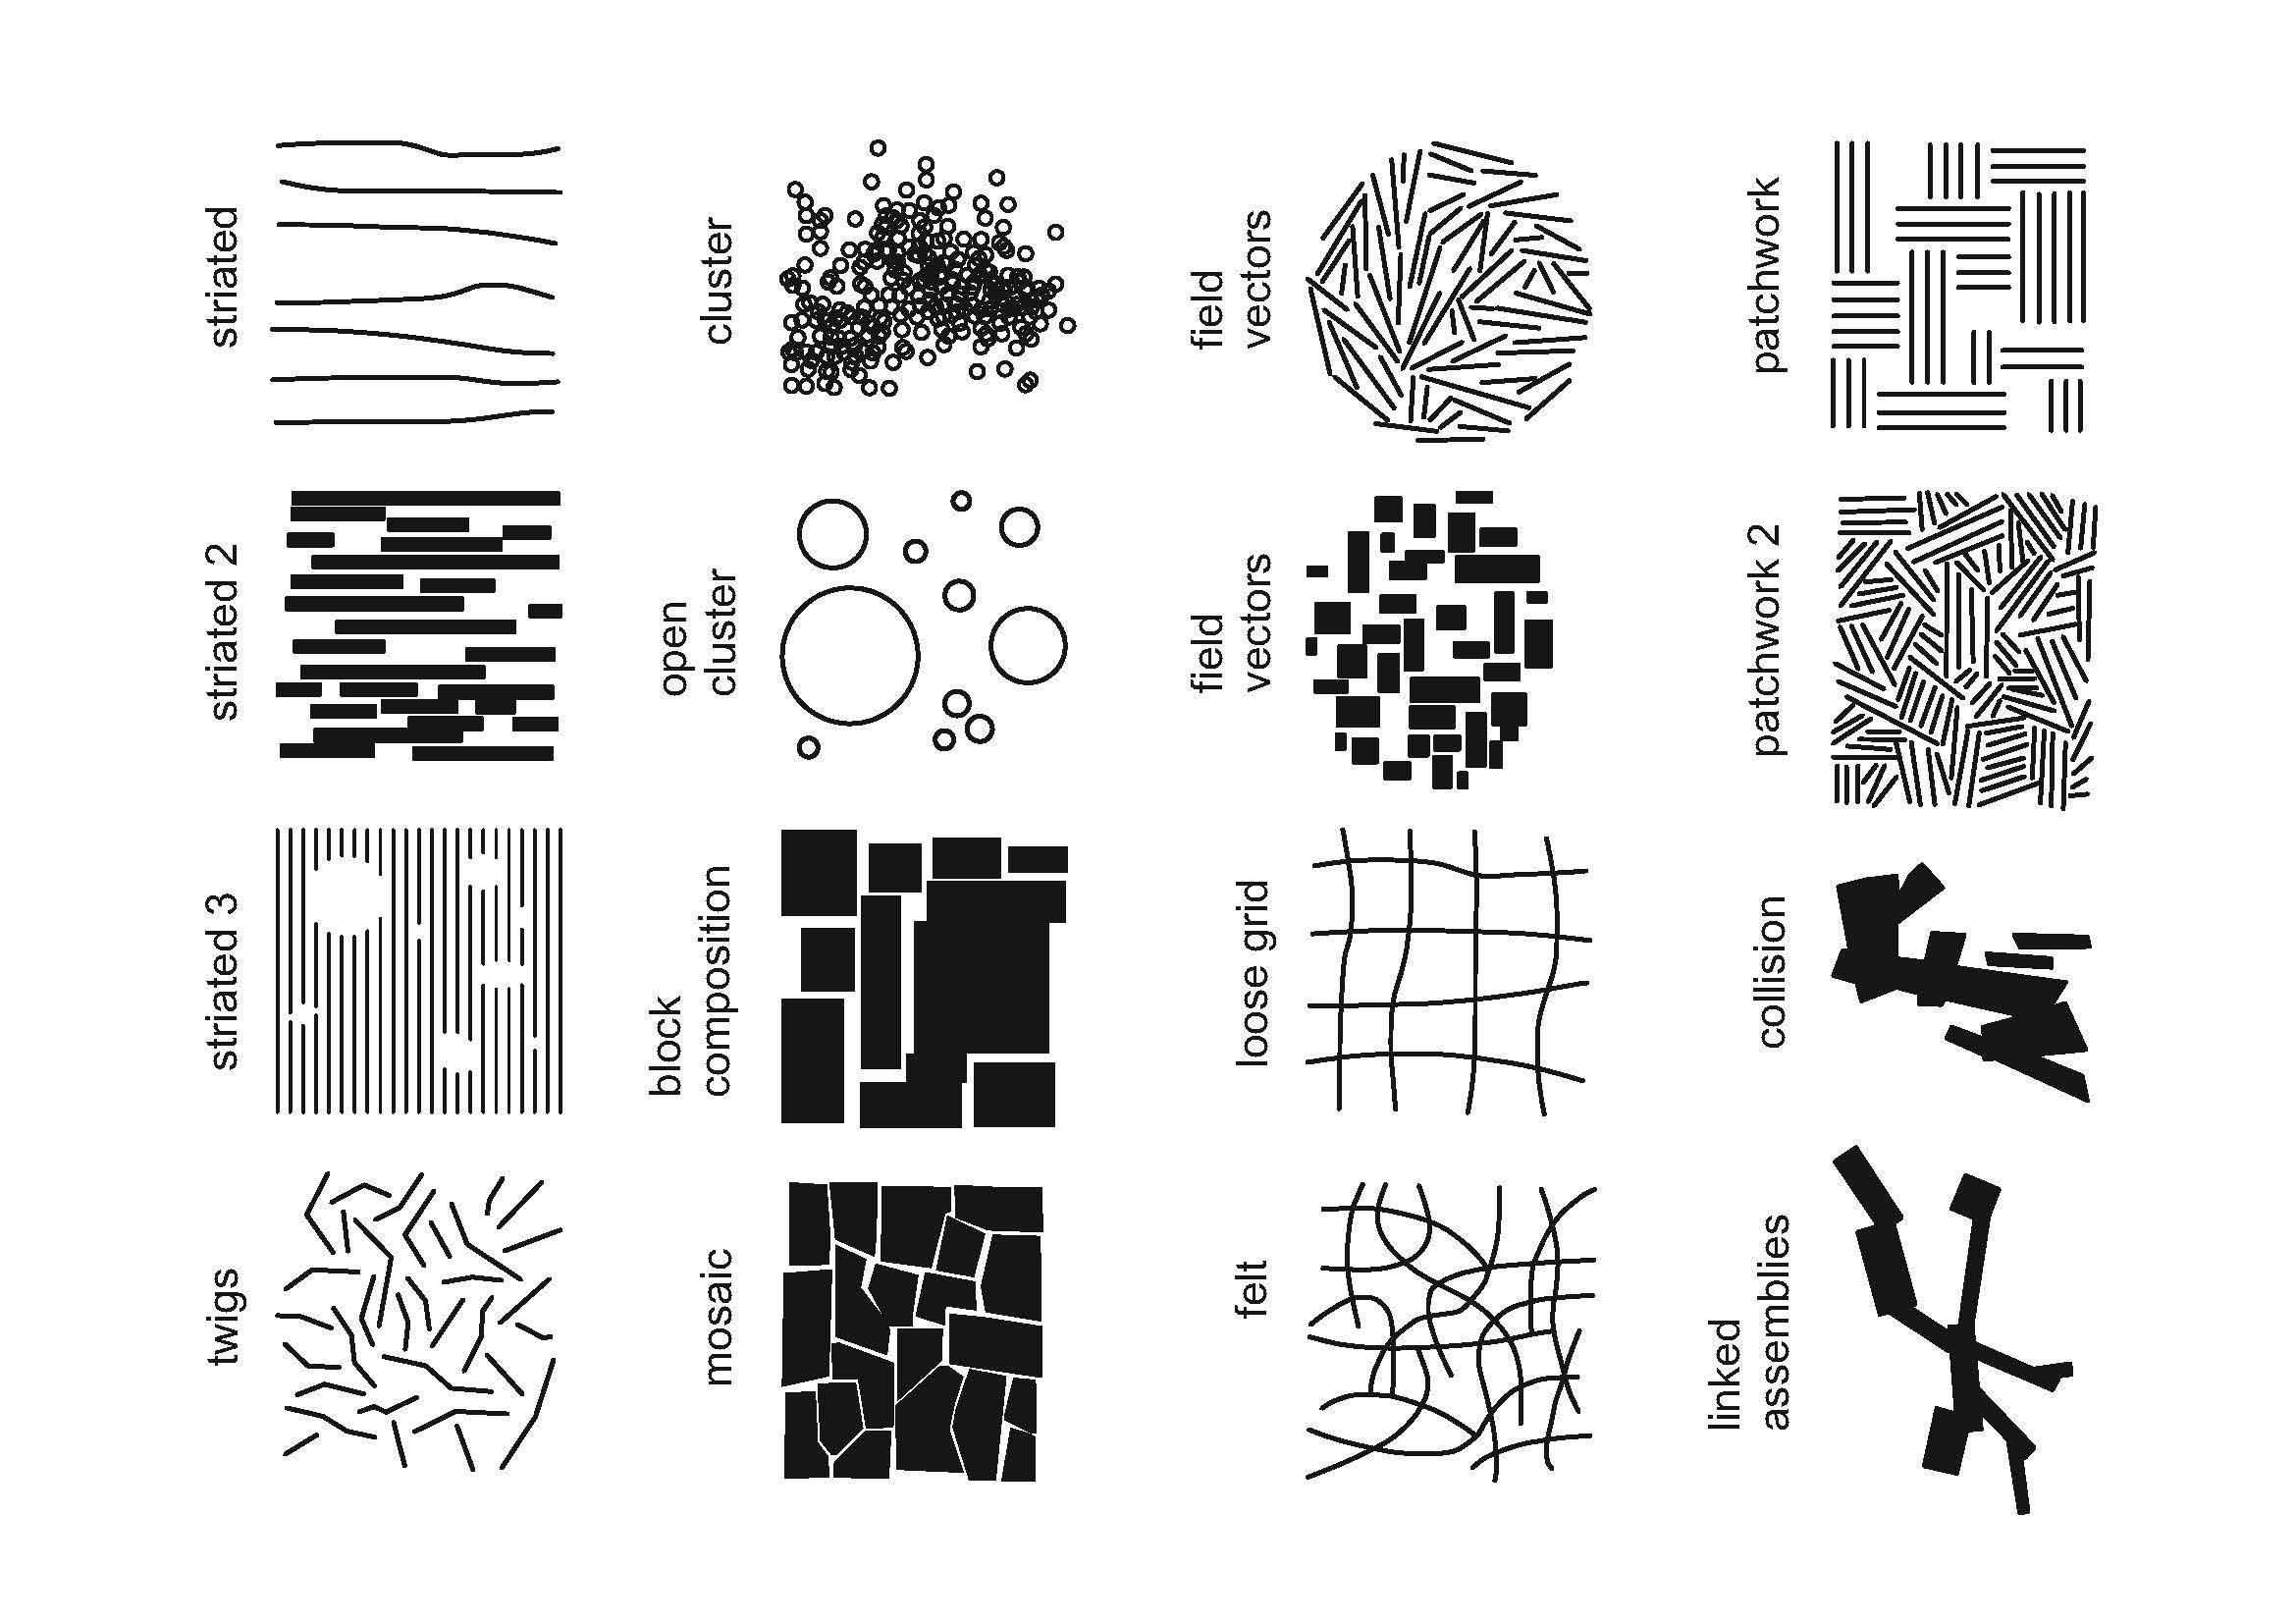 Diagramy stan allen abstract spatial diagrams pinterest diagramy stan allen publicscrutiny Images